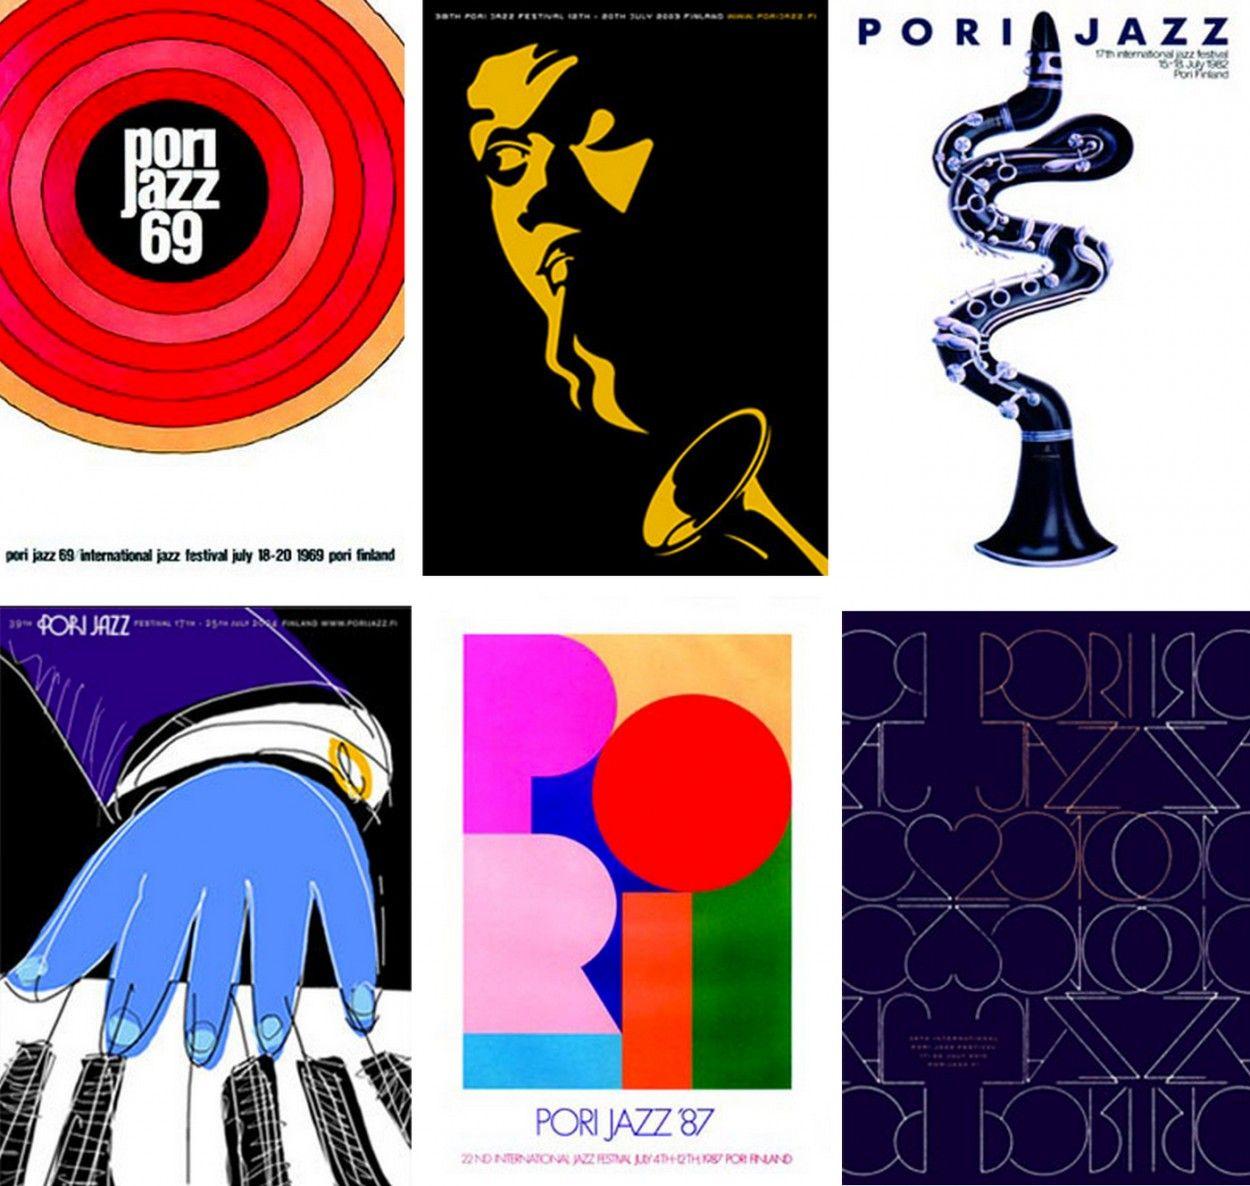 pori-jazz-julisteet2.jpg